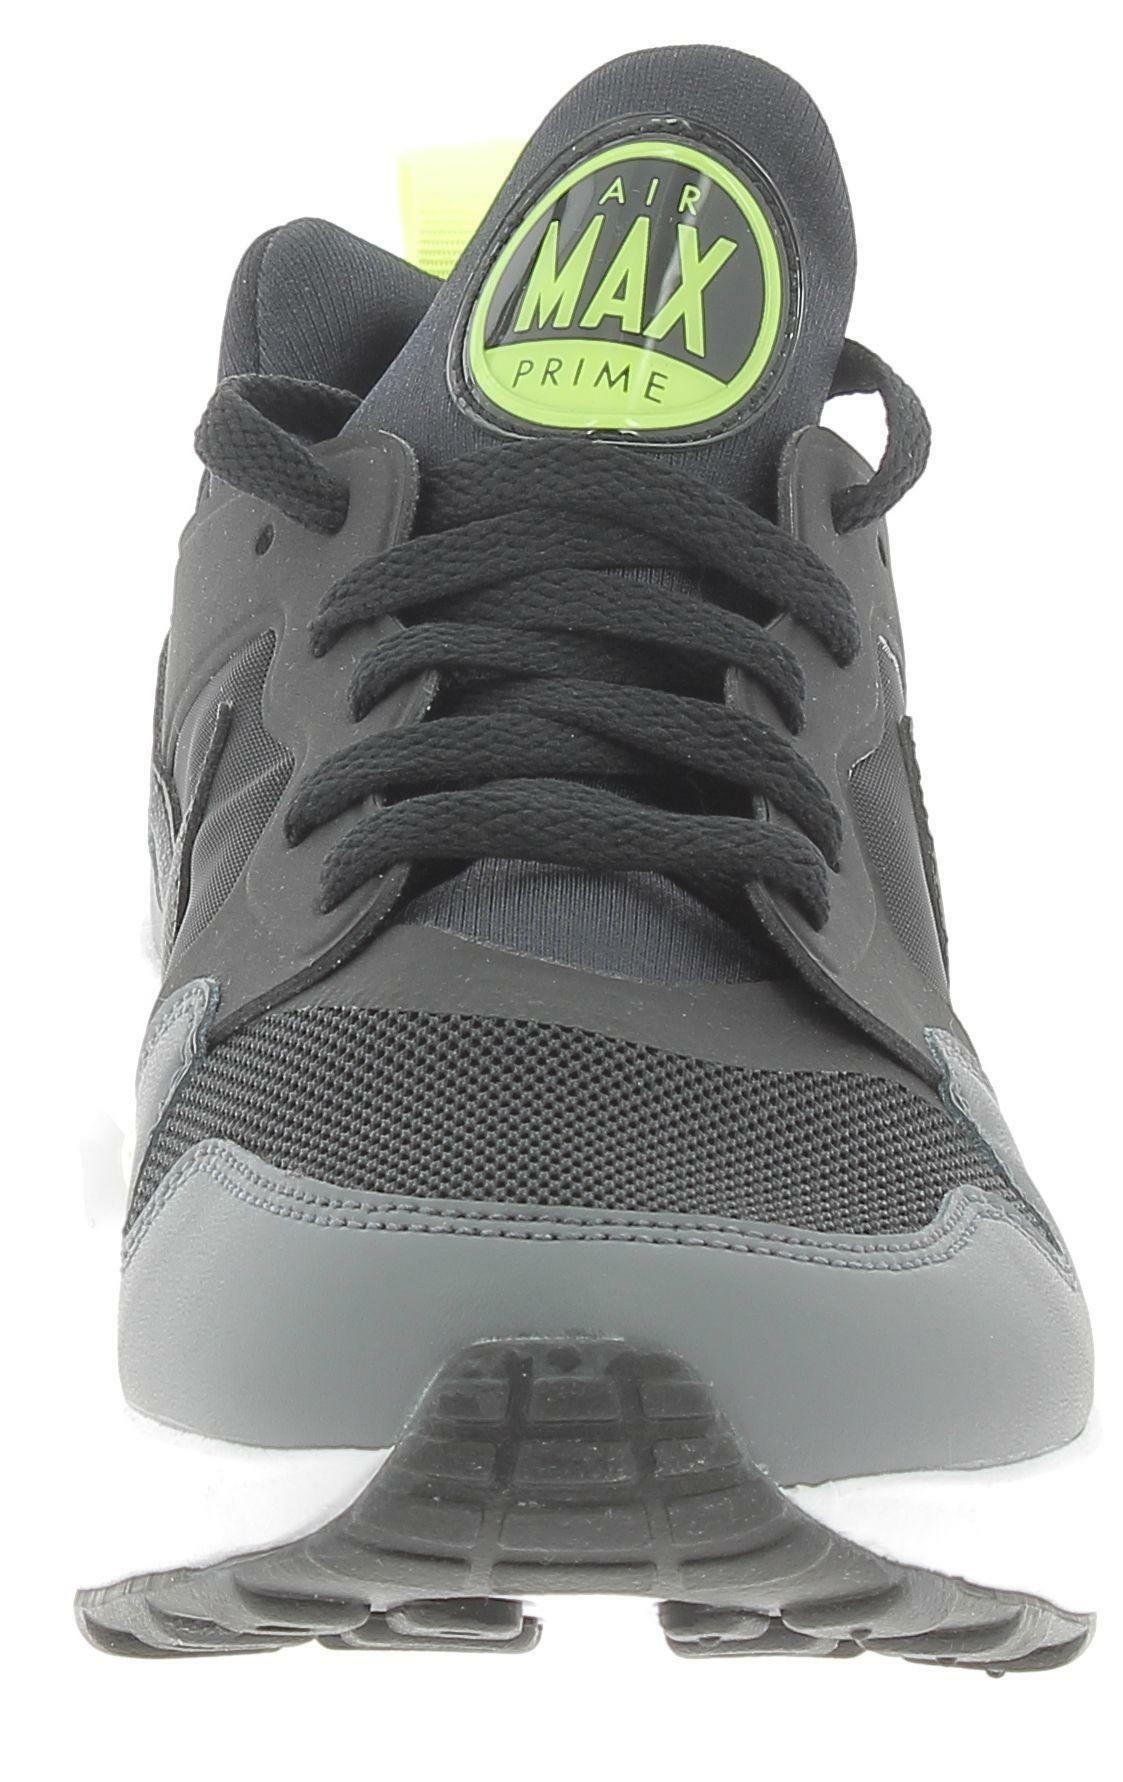 09a9b23d935213 Nike Air Max Prime Herren schwarze Sportschuhe